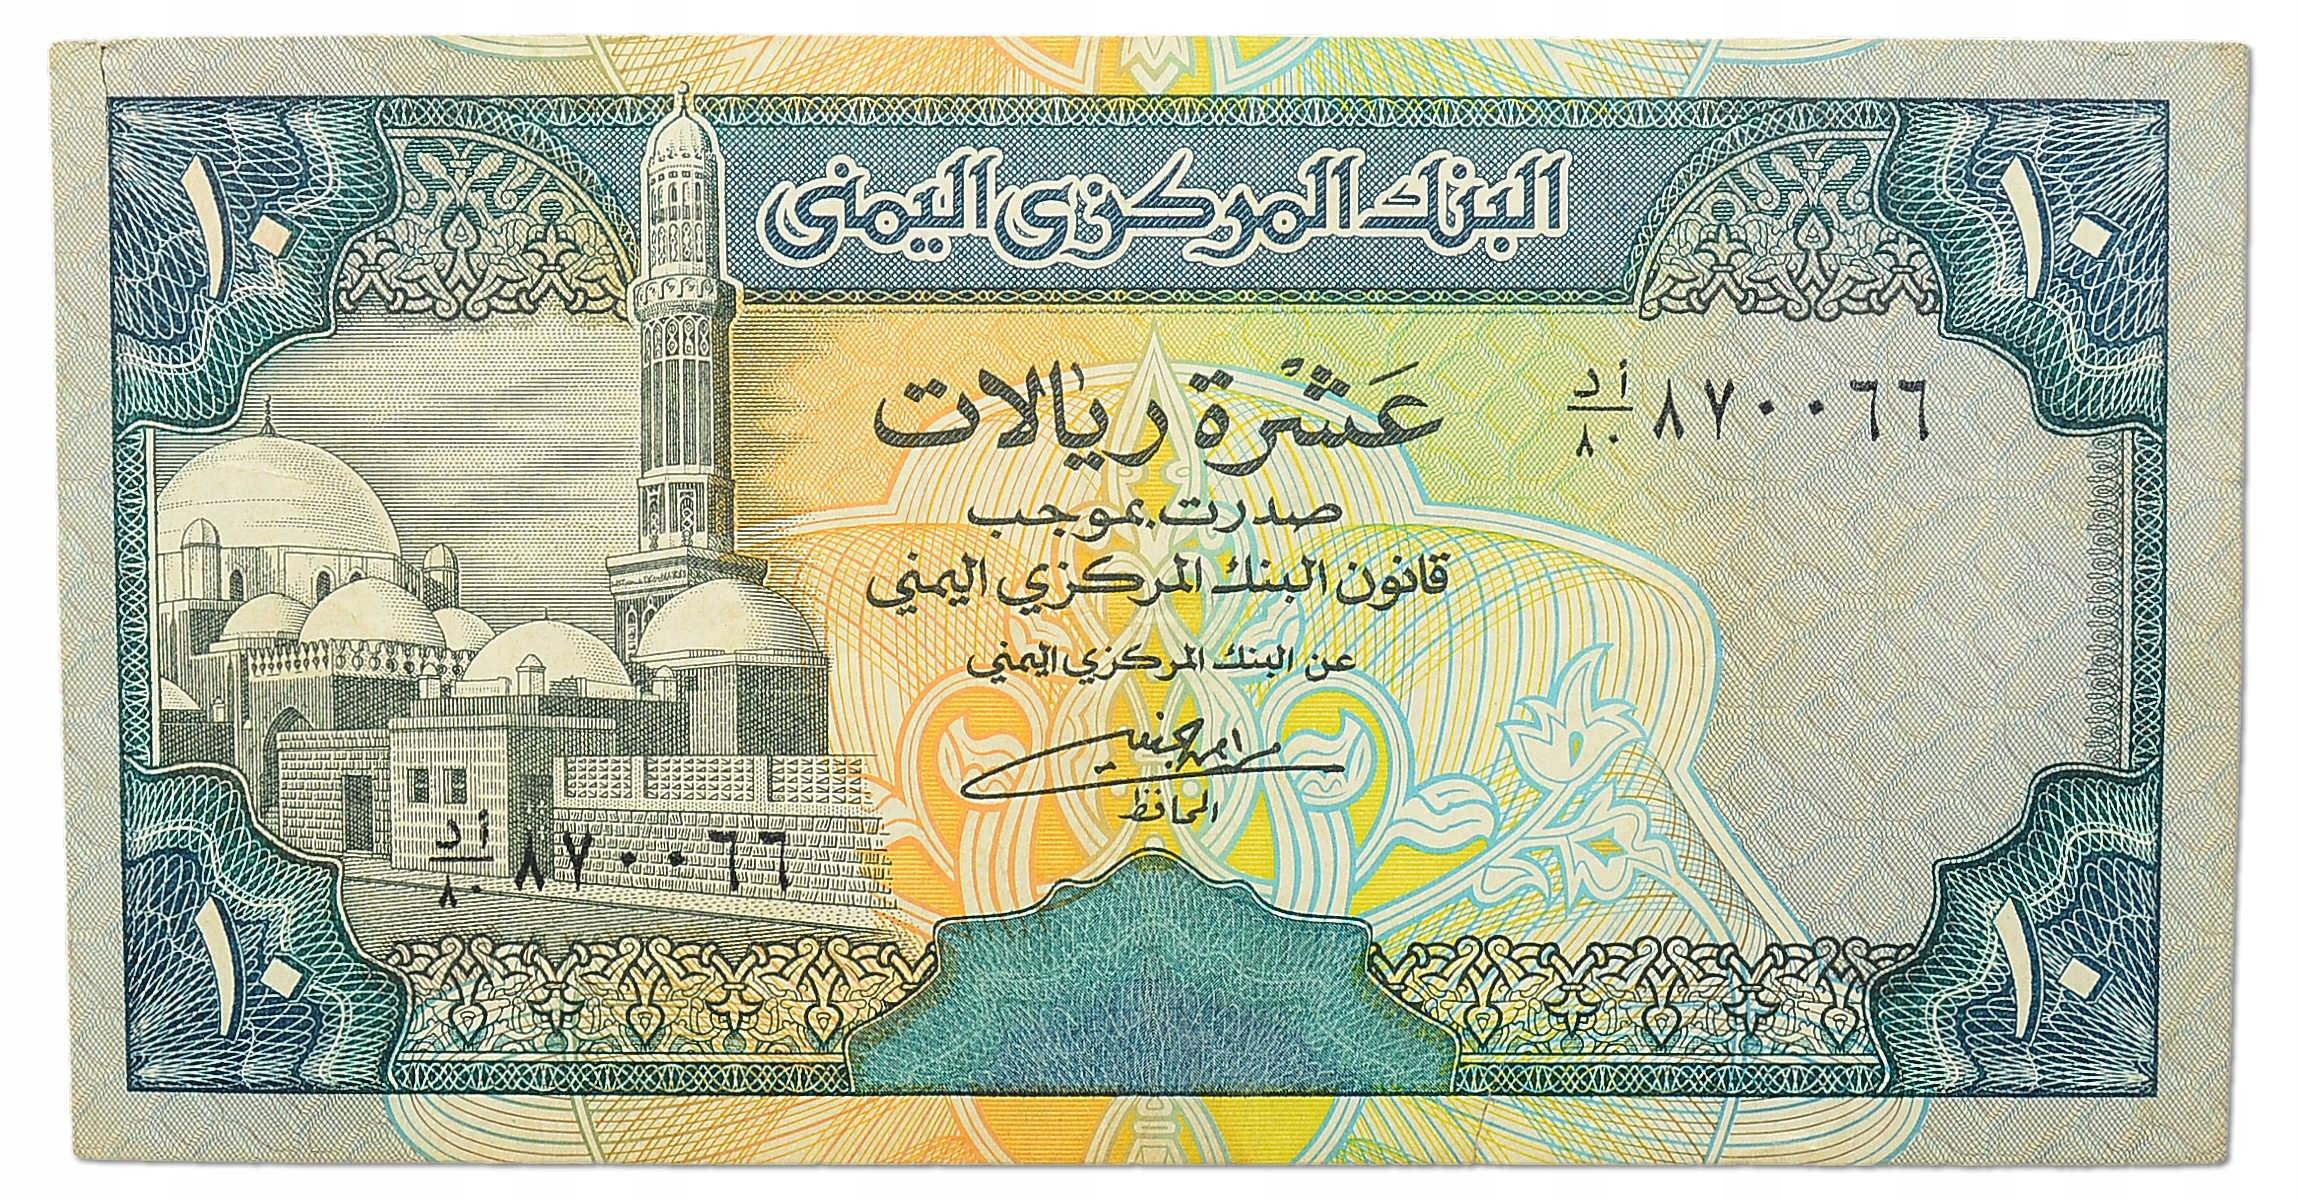 3.Yemen, 10 Riali 1992, P.24, St.3-